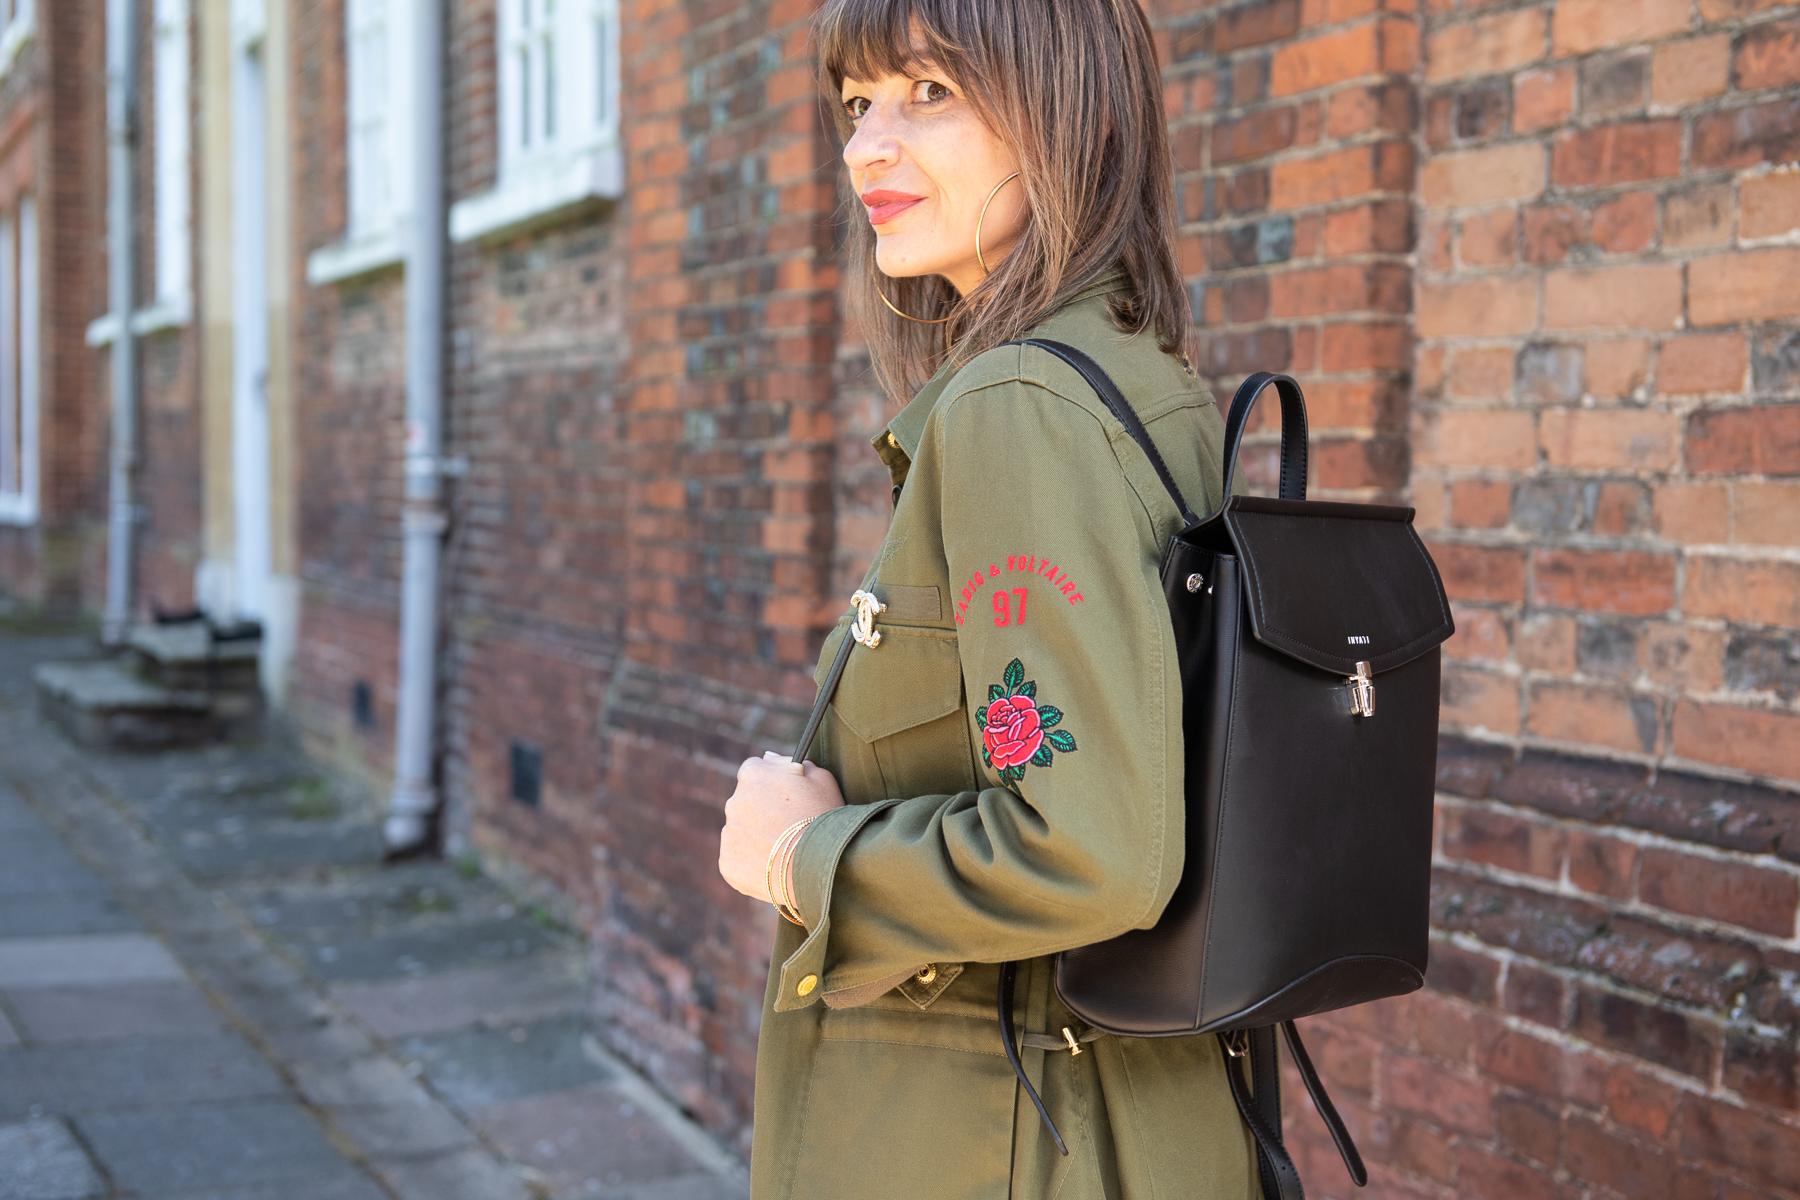 army jacket & rucksack